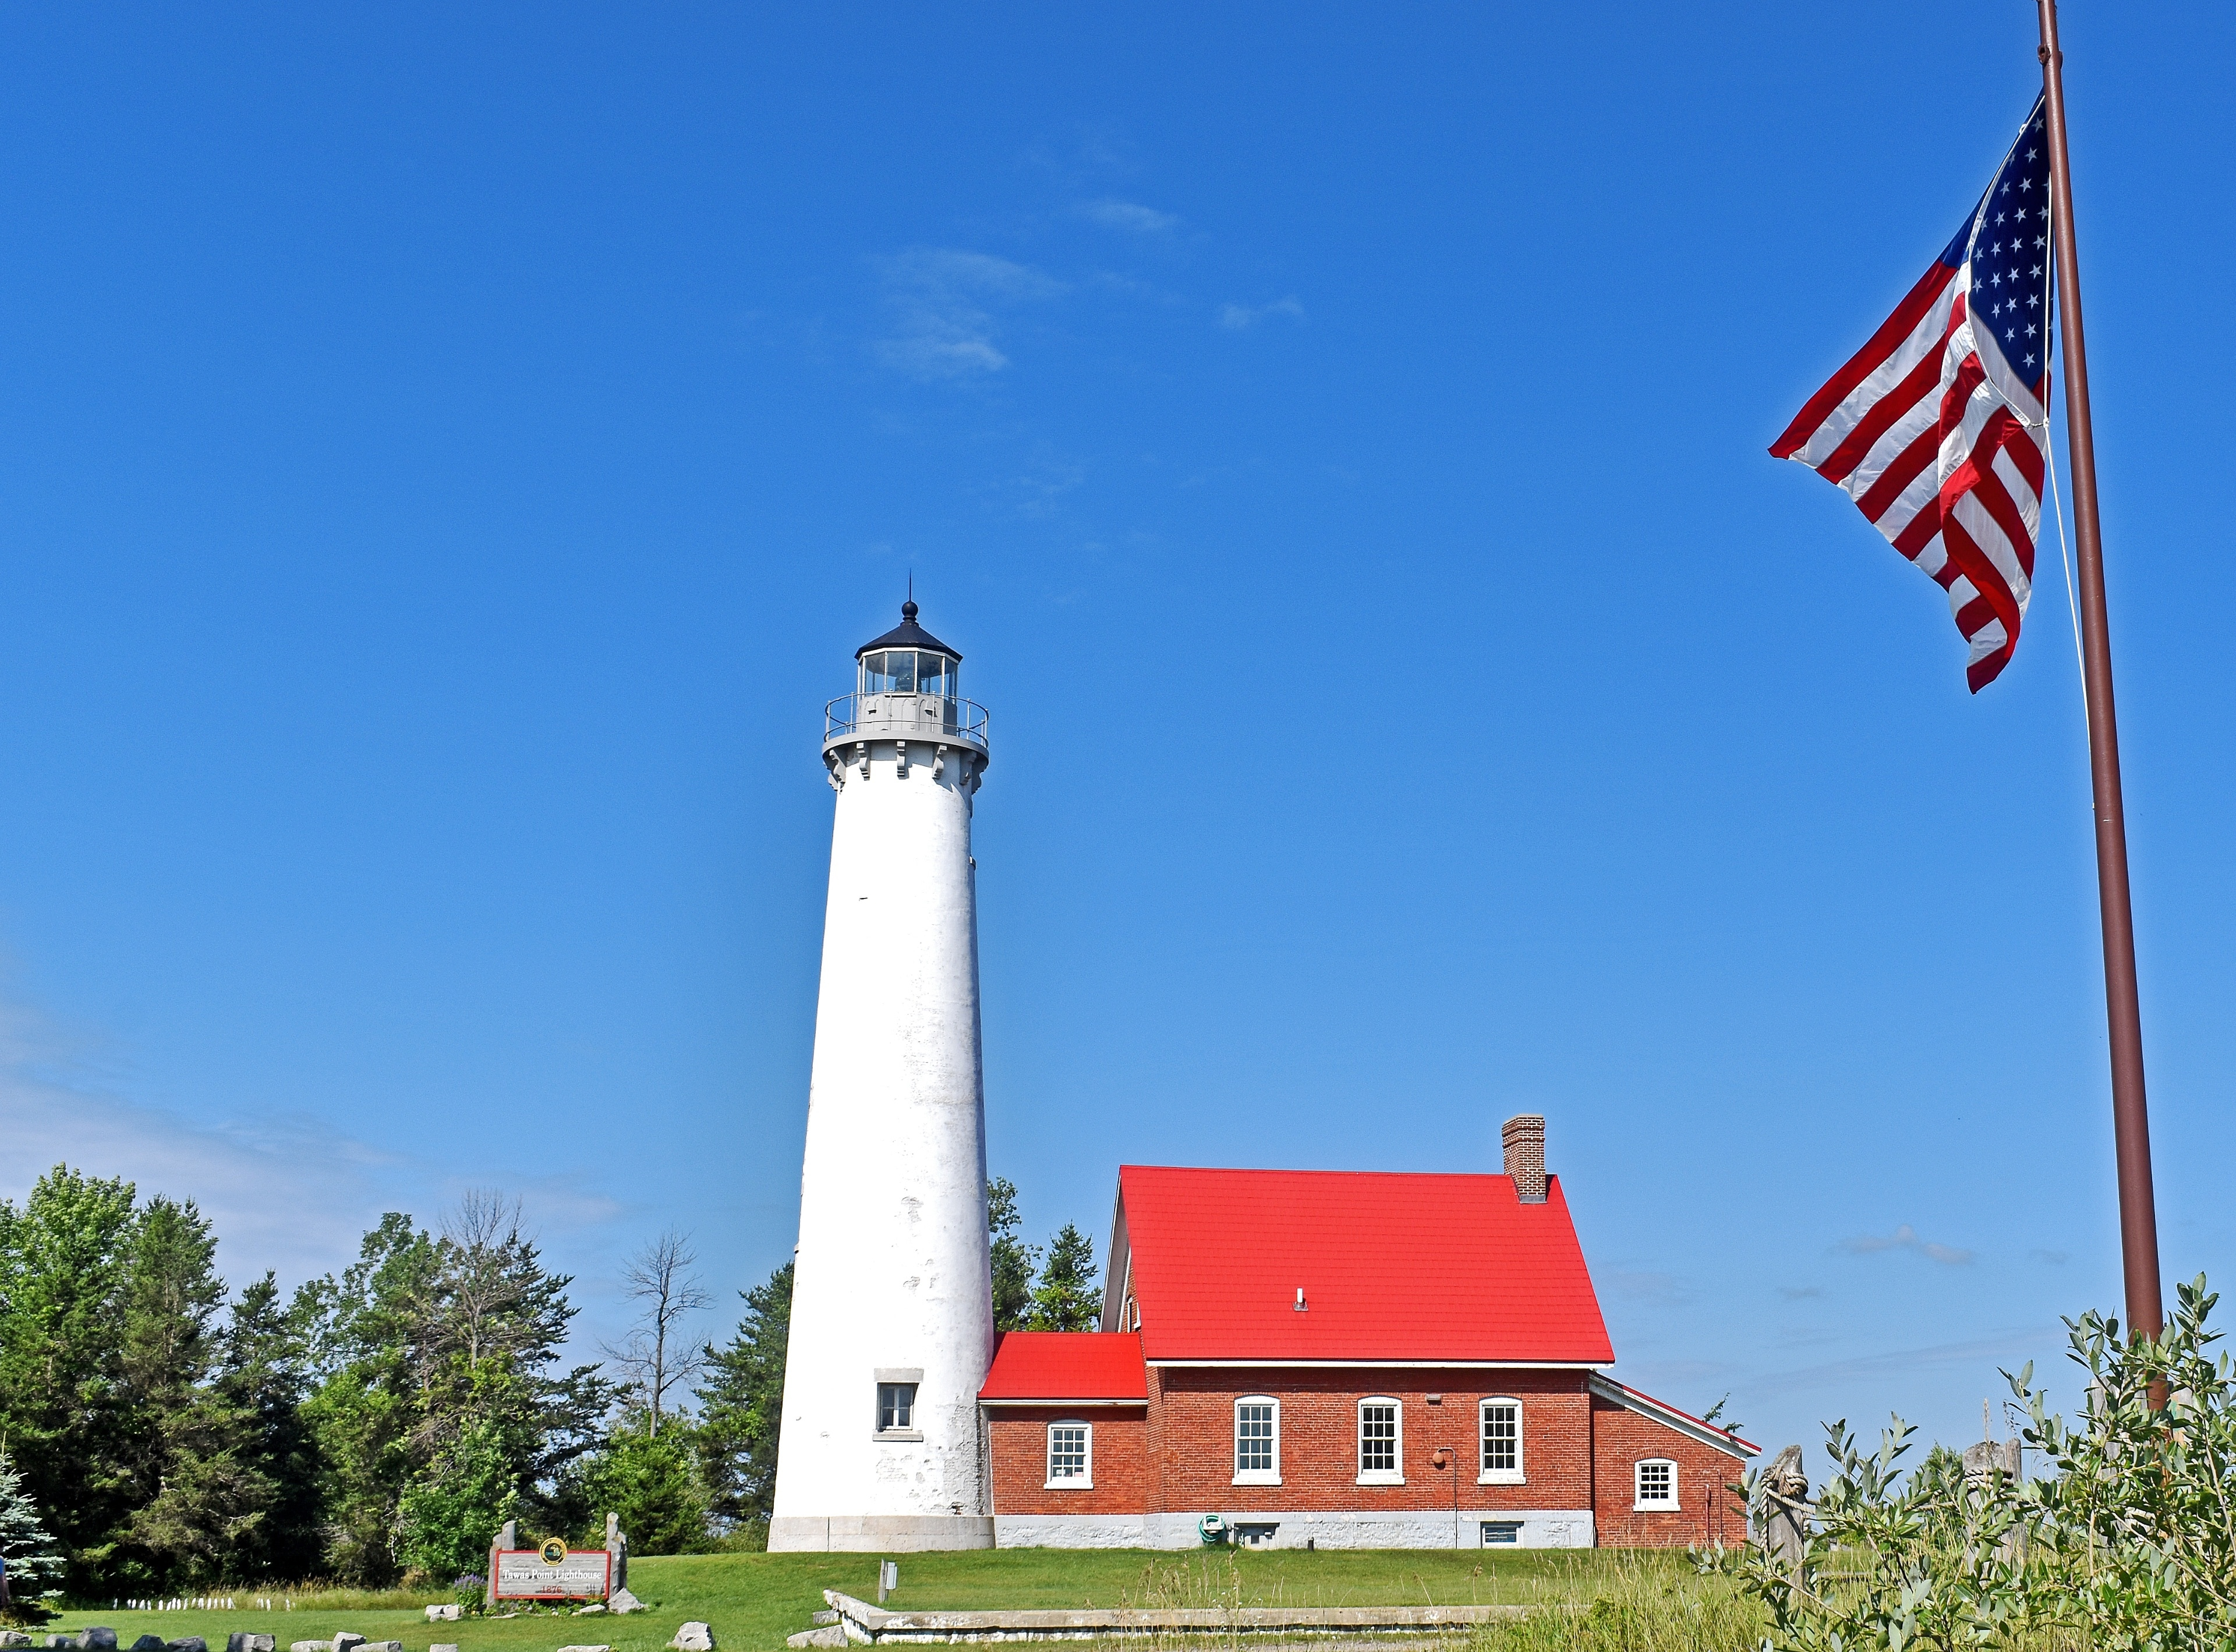 East Tawas, Michigan, United States of America